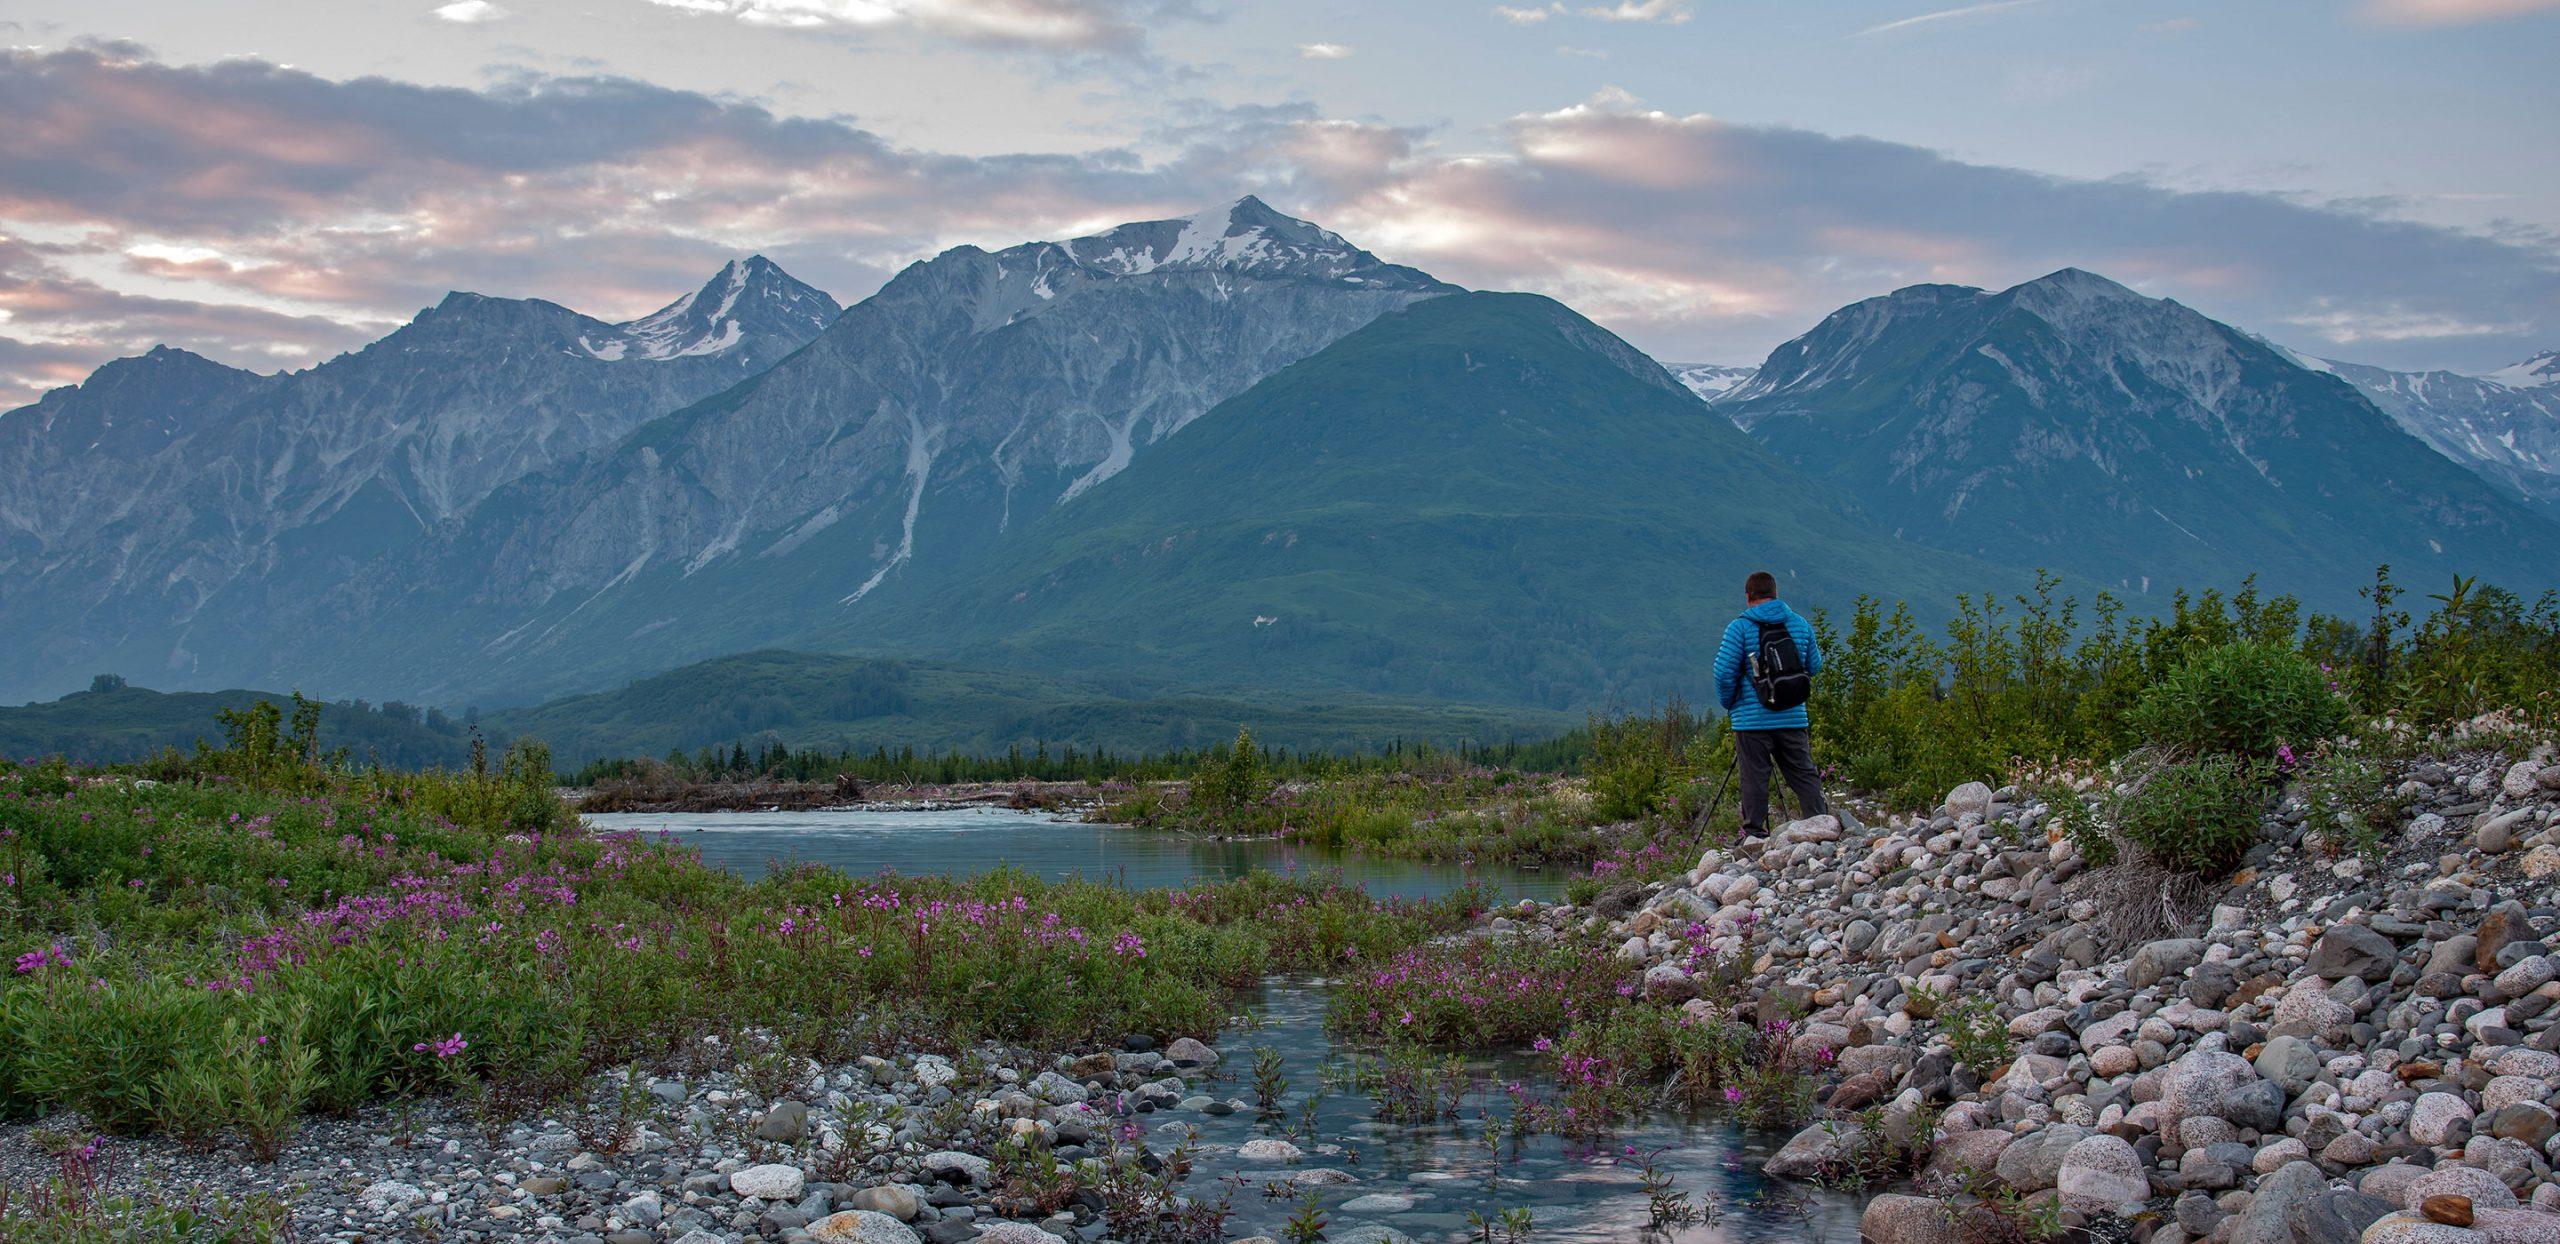 Dusk at Melt Creek - Rafting Alaska's Tatshenshini-Alsek River